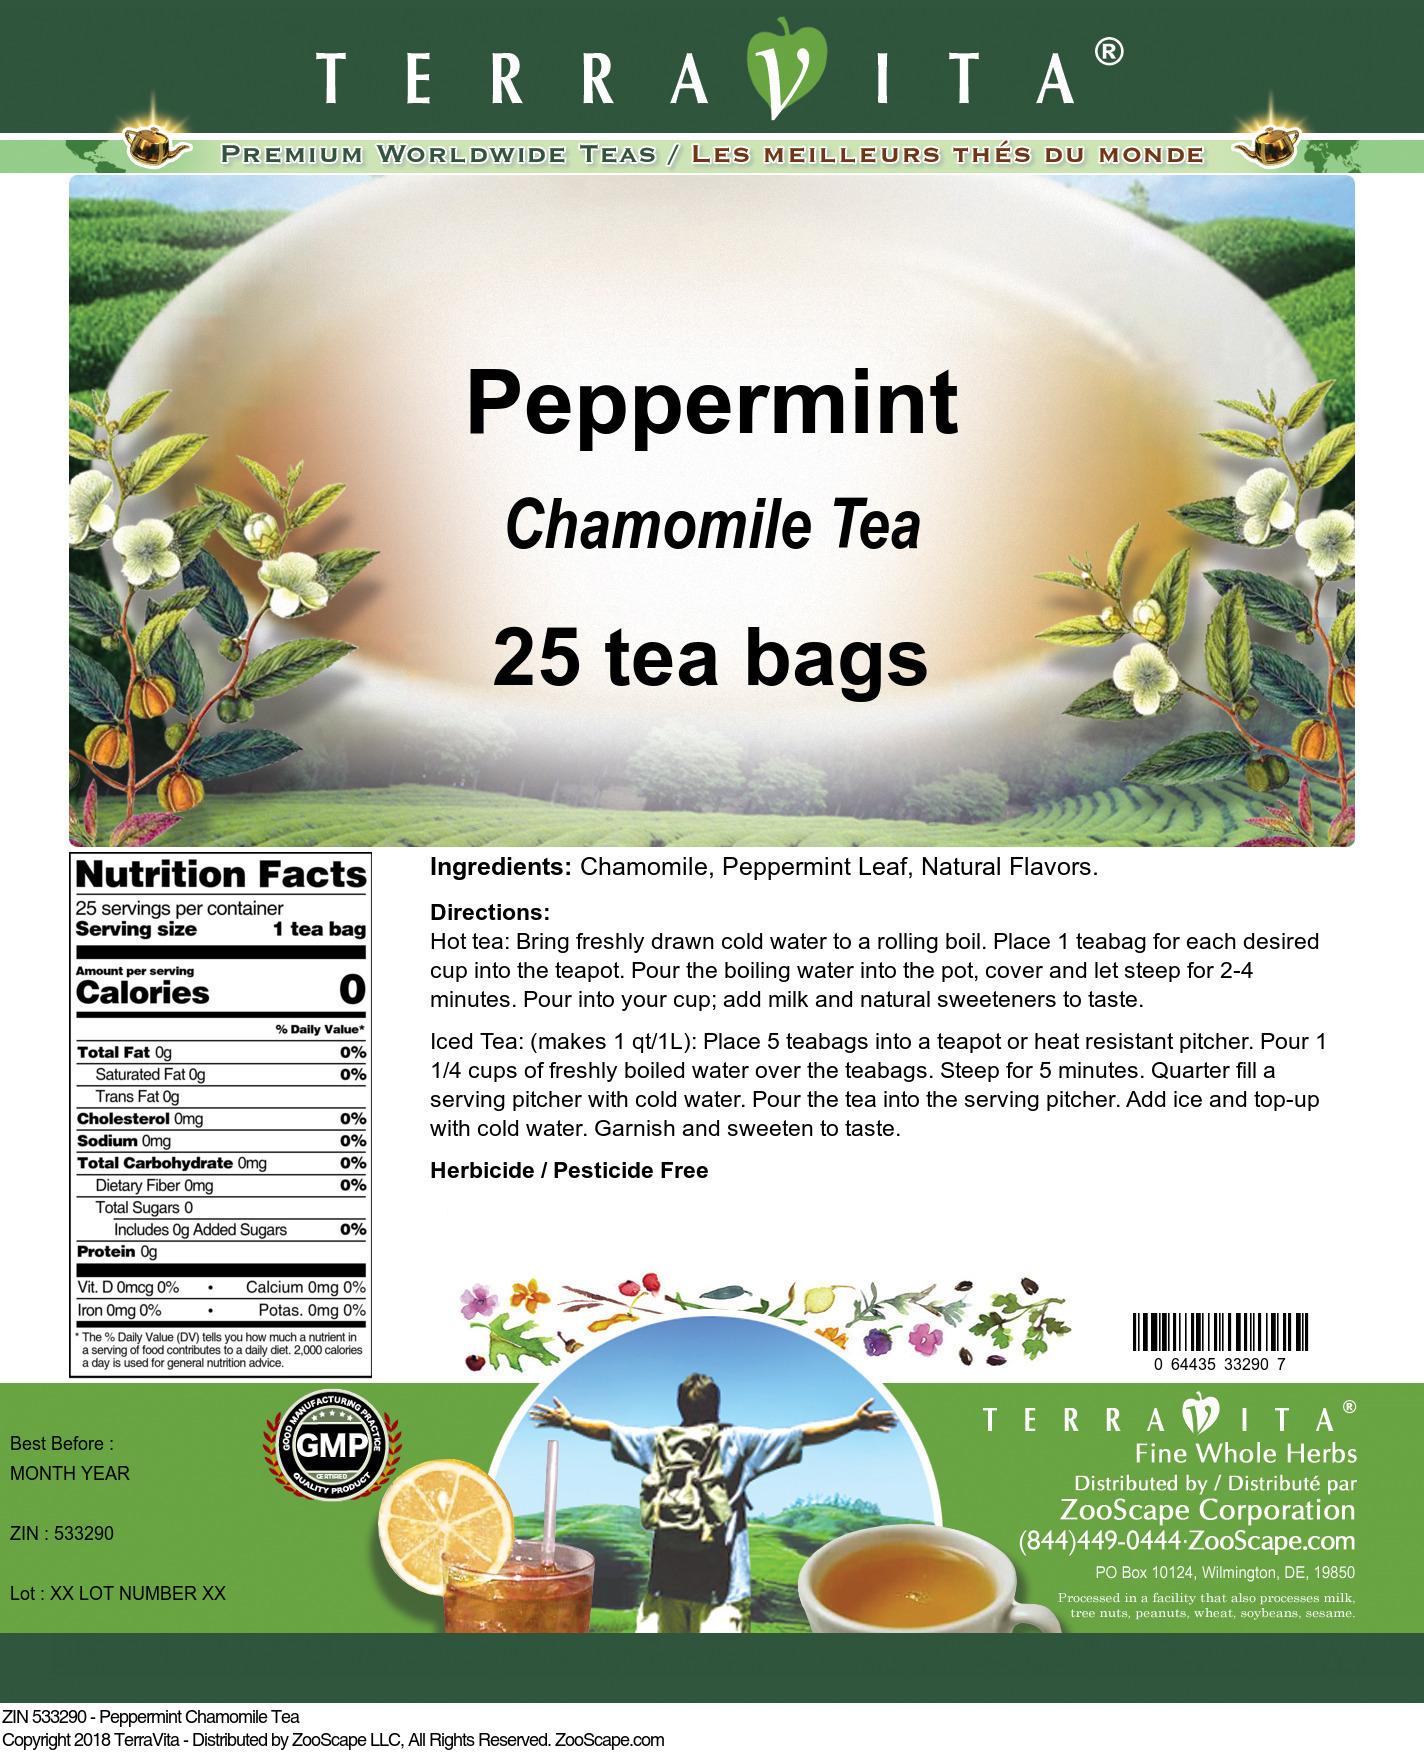 Peppermint Chamomile Tea